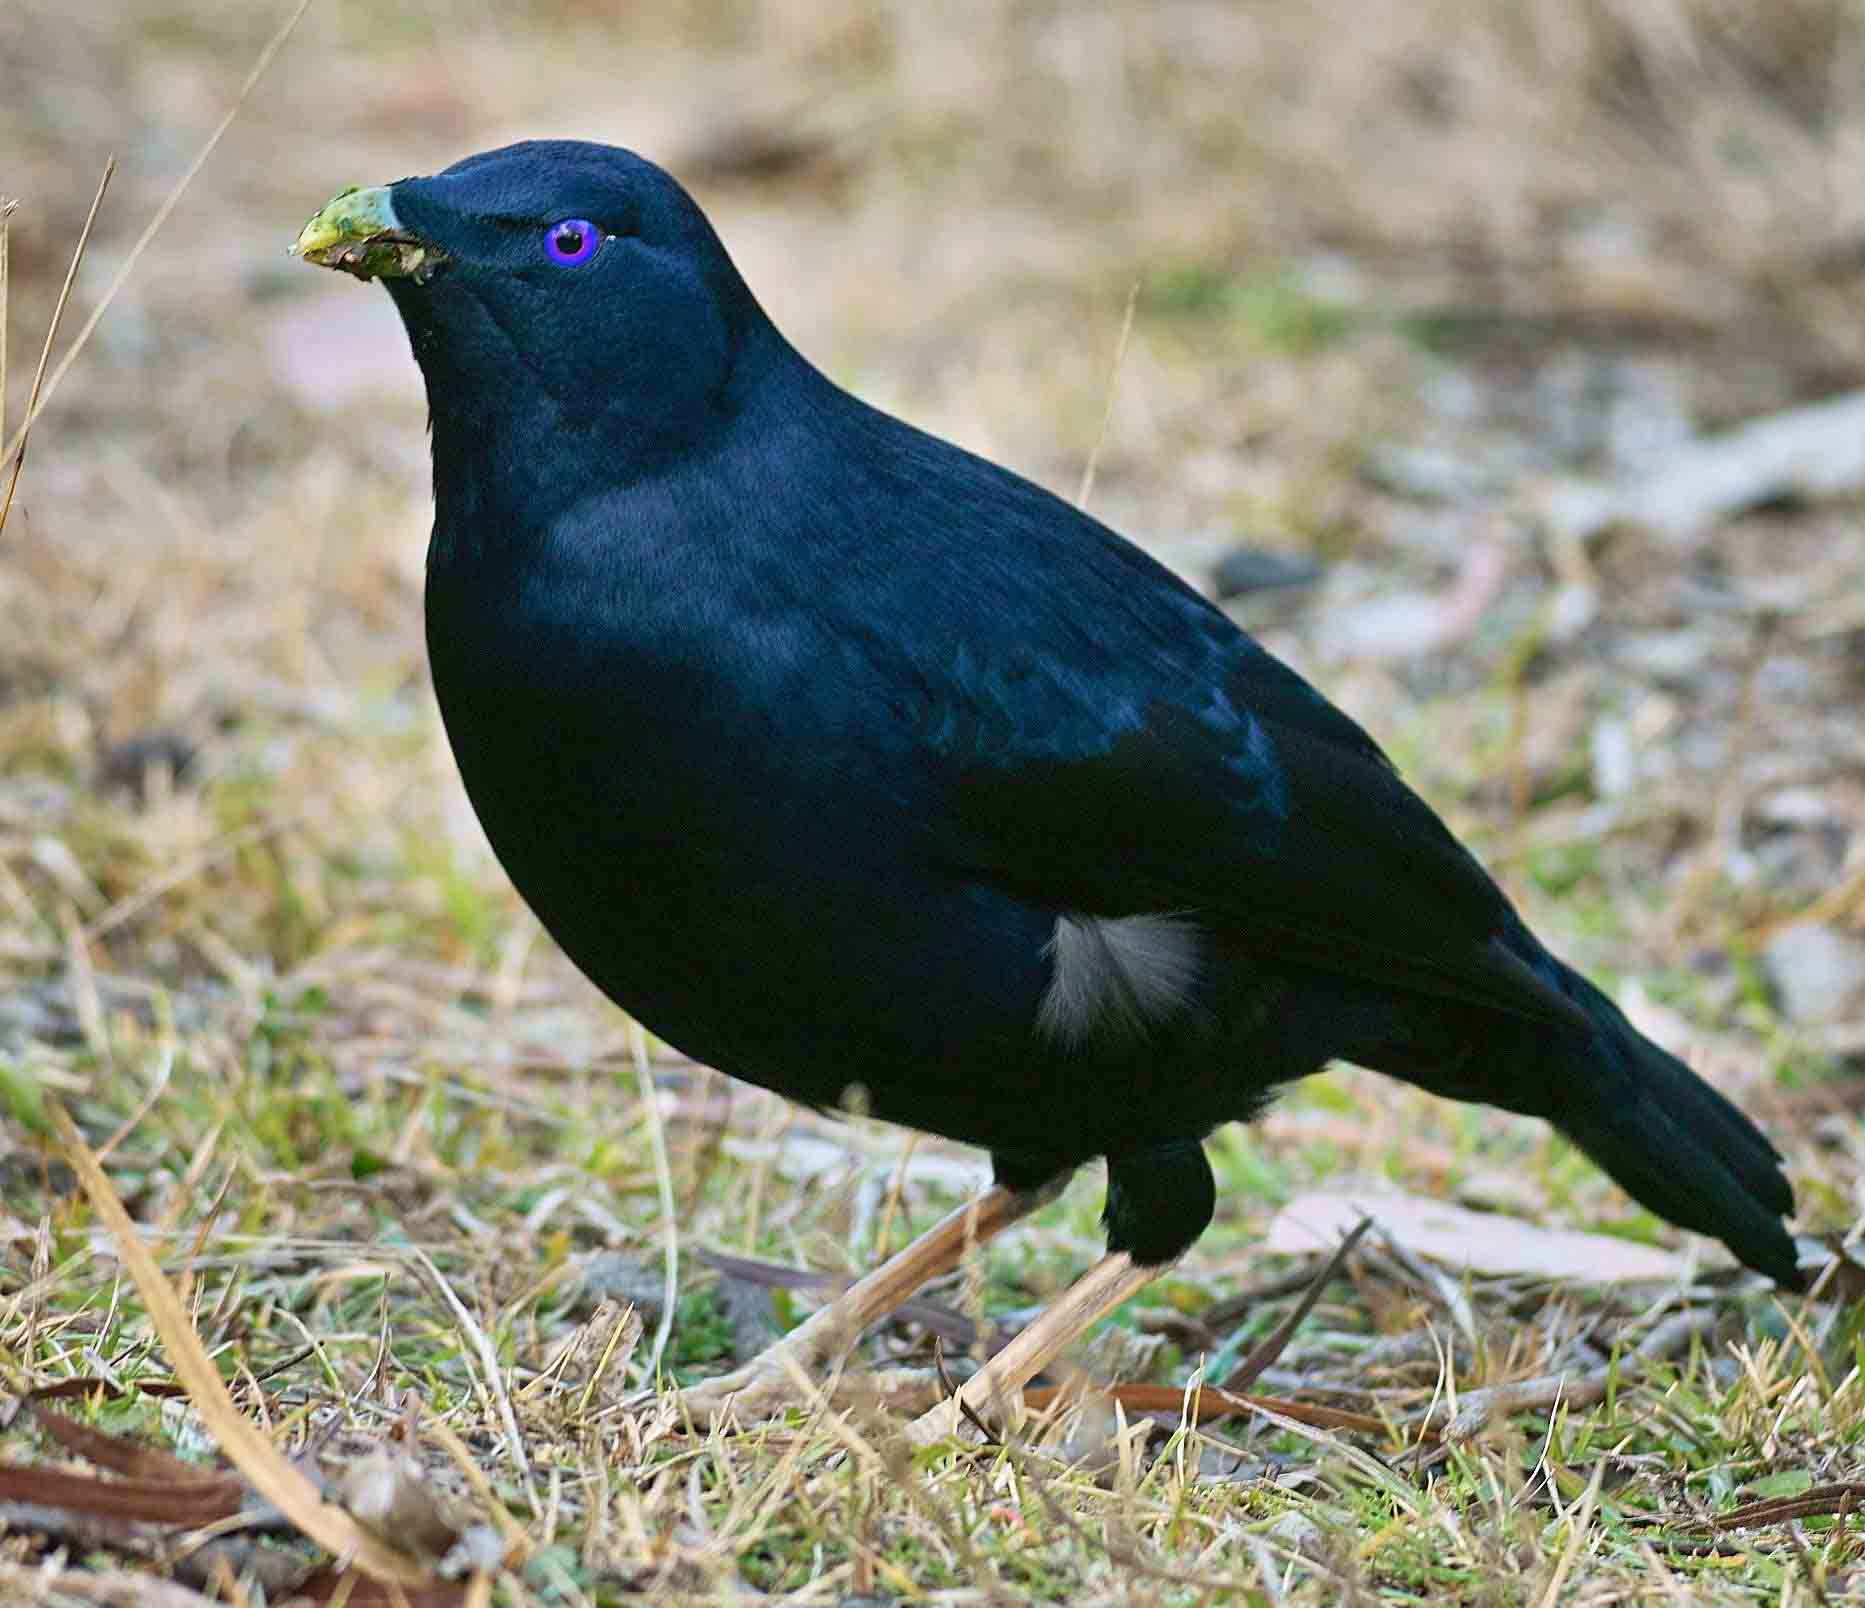 Satin bowerbird pictures